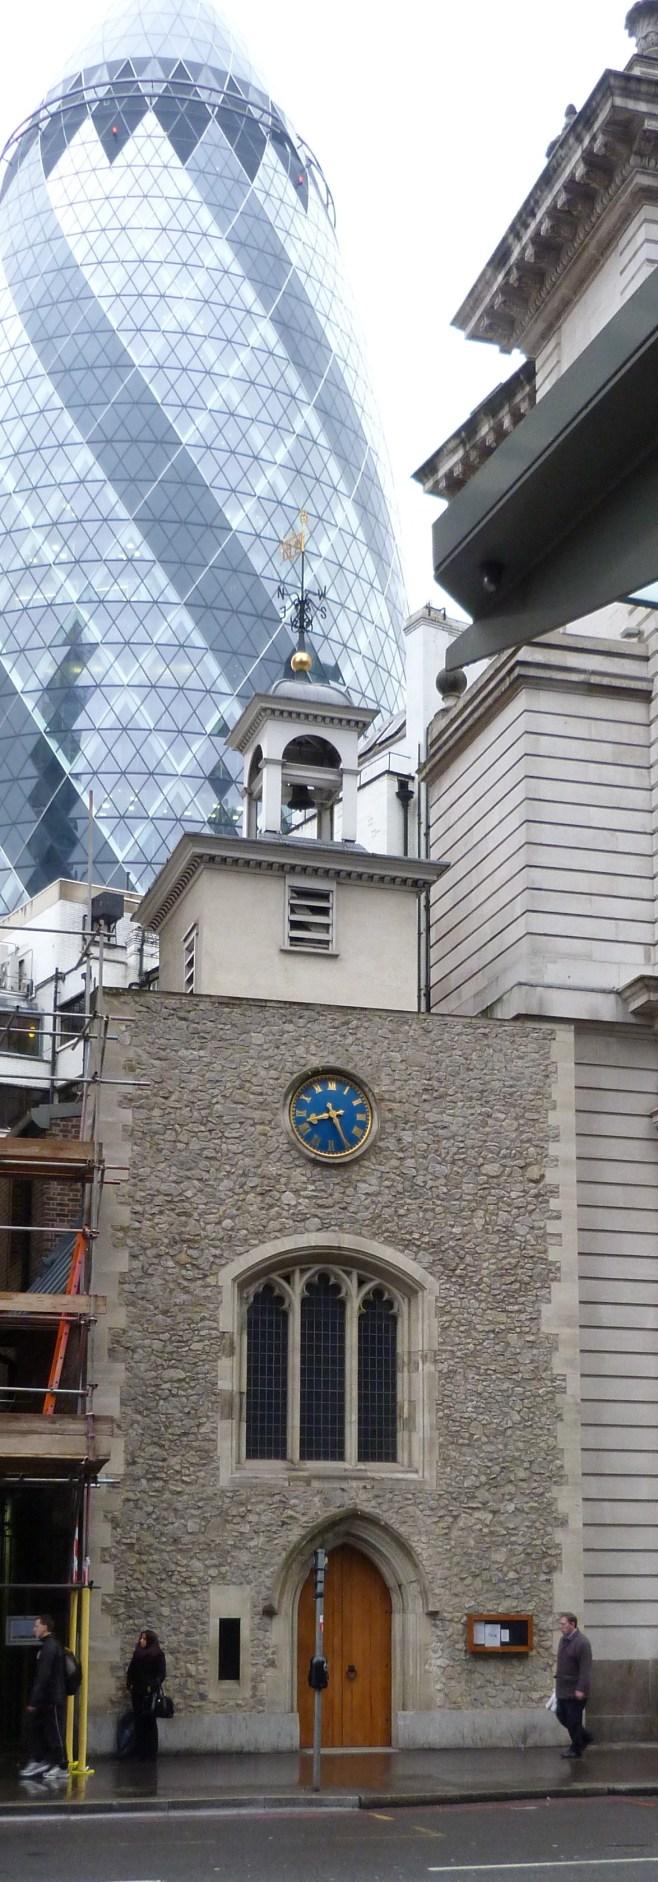 Church with Gherkin in background.JPG